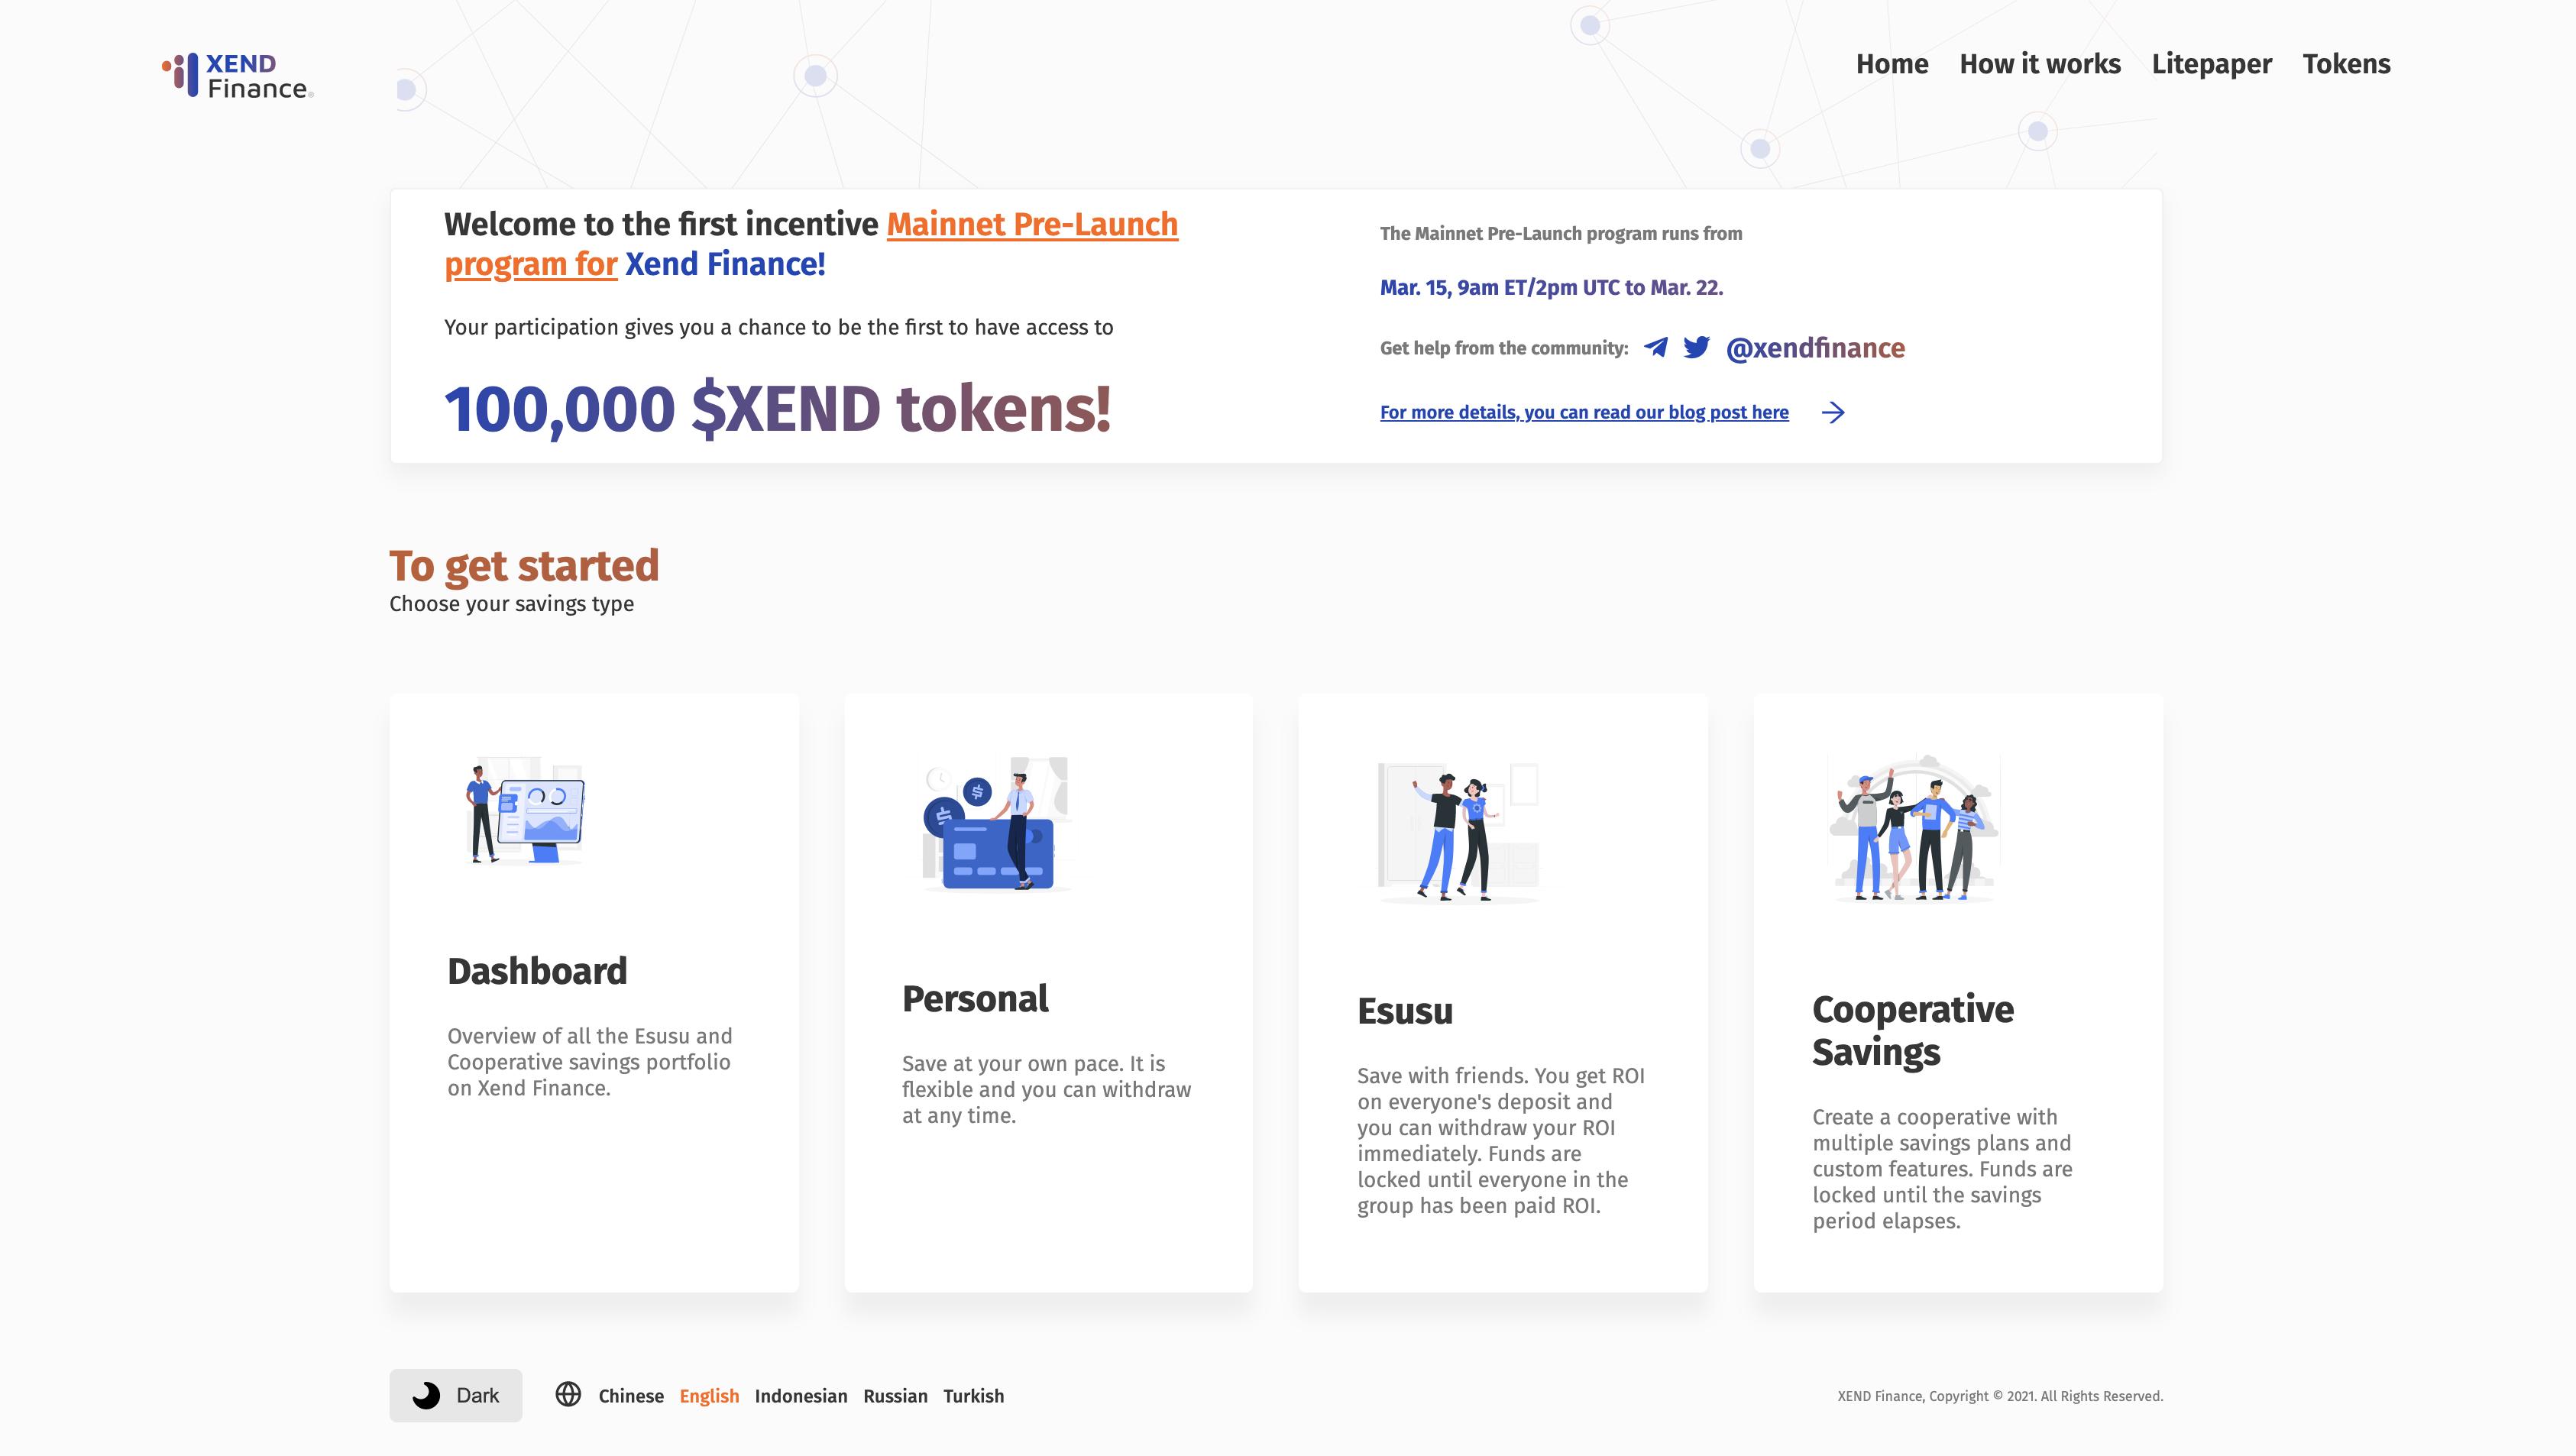 DeFi新玩法丨一文了解DeFi信用合作社平台Xend Finance